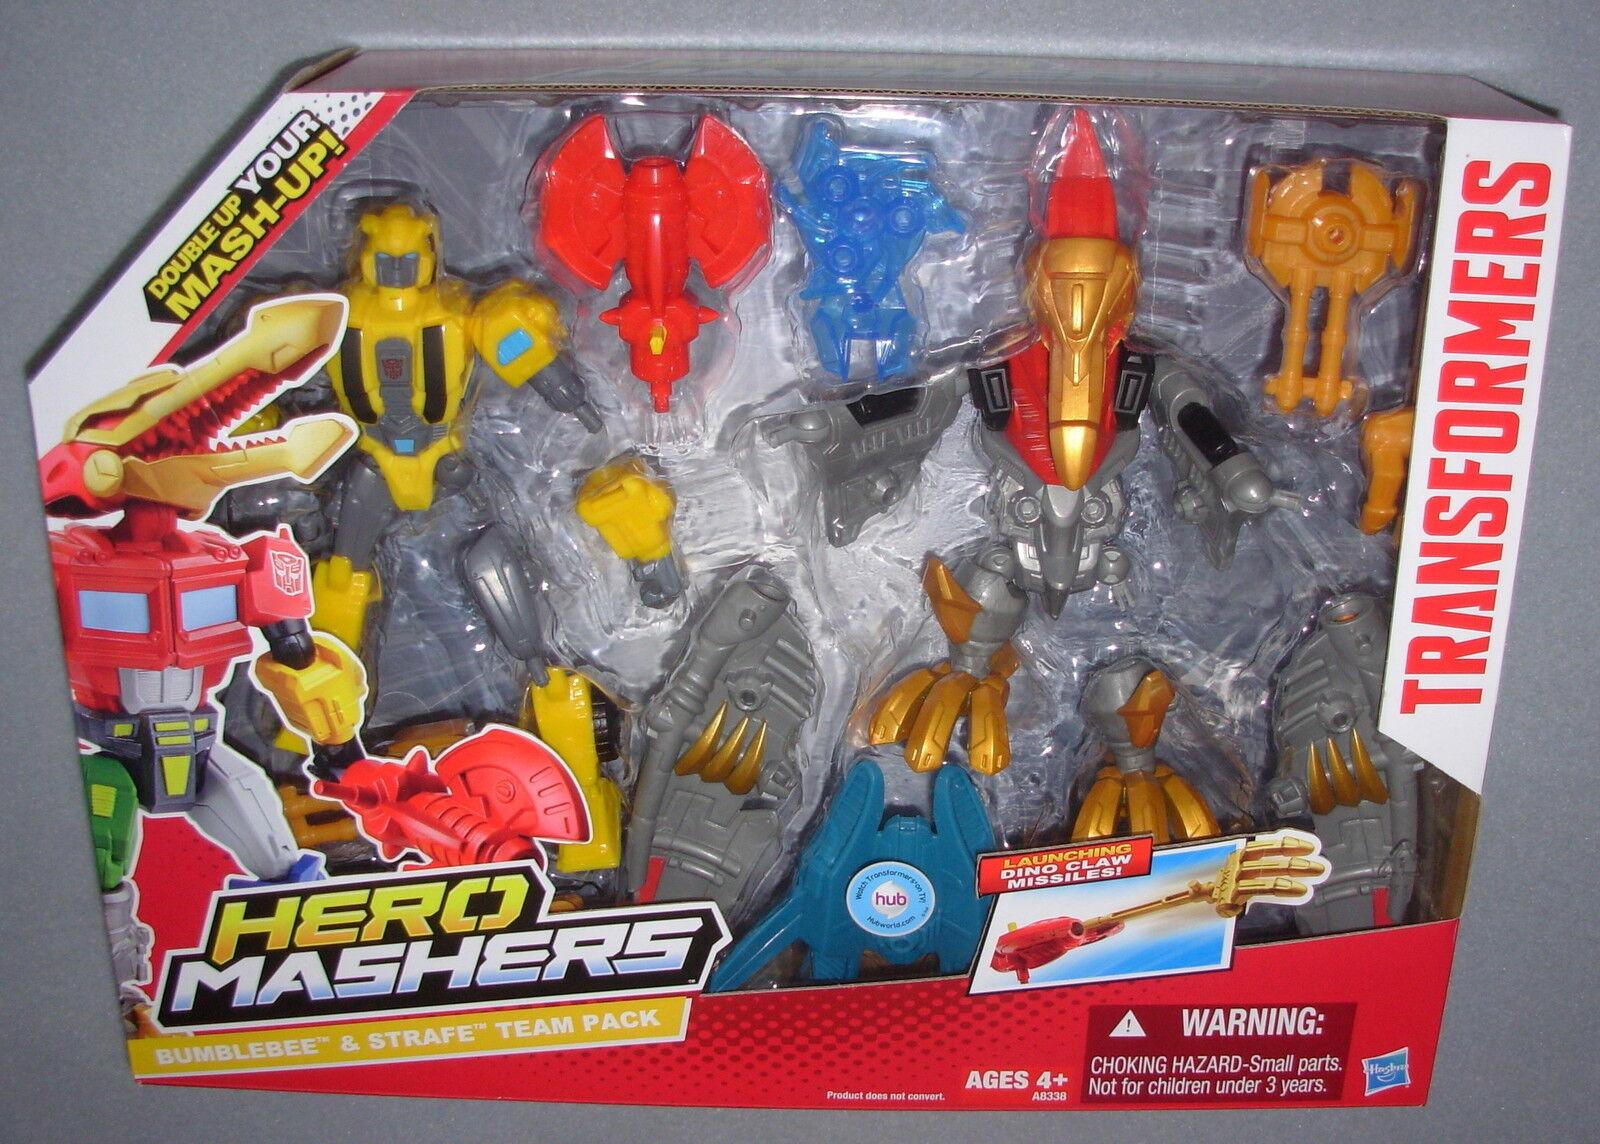 TRANSFORMERS HERO MASHERS BUMBLEBEE & STRAFE FIGURE BOX SET MIB